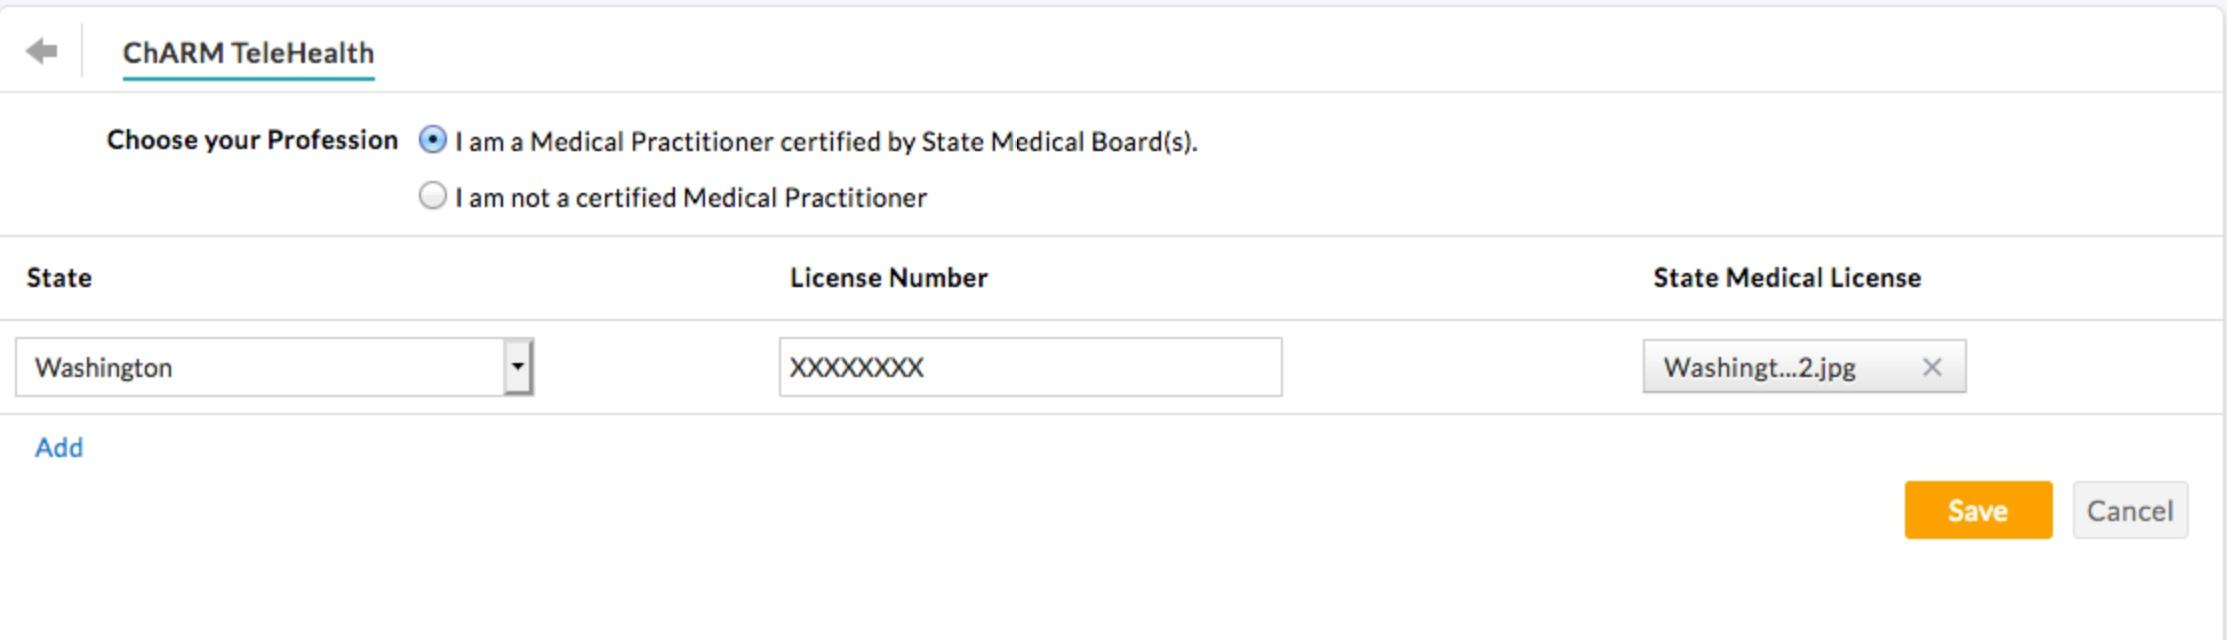 TeleHealth State Medical License